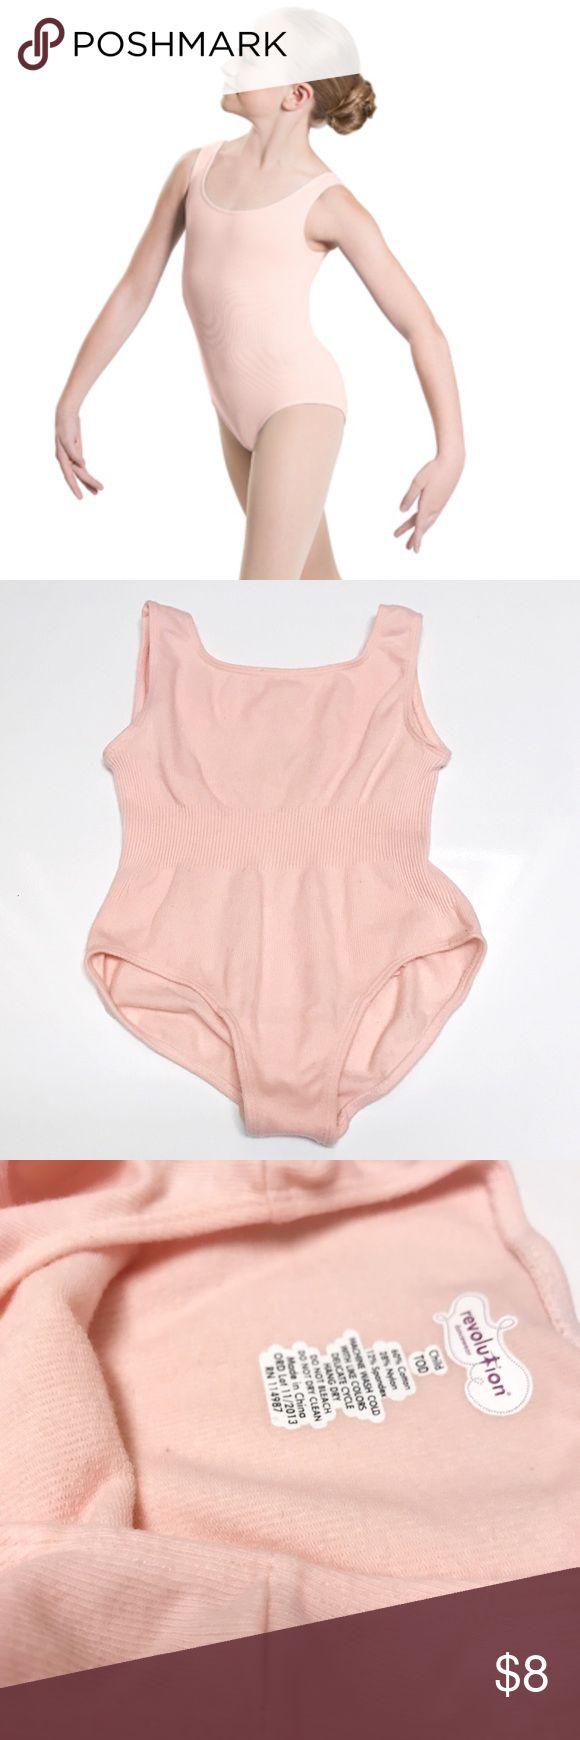 Pink Leotard Toddler Revolution Dance Toddler Leotard (XS) in Pink.  Worn and washed once. Revolution Dancewear One Pieces Bodysuits